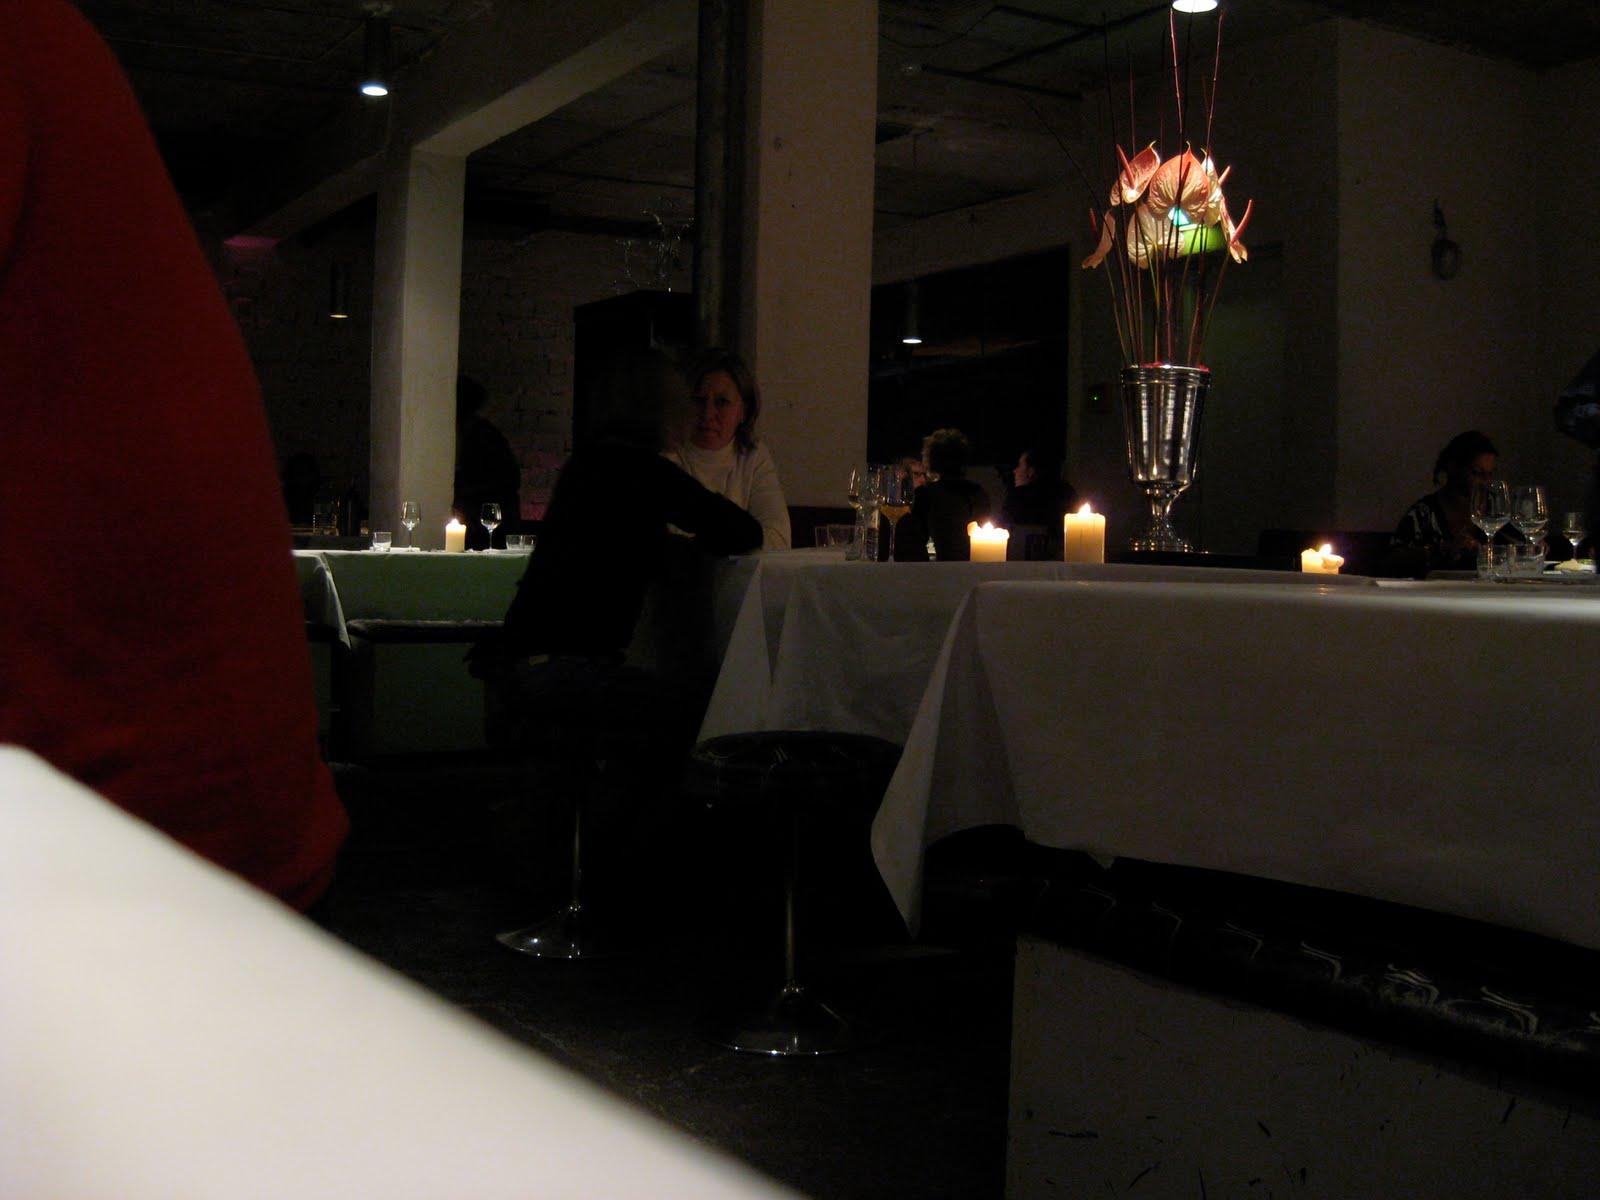 Abdullah+the+butcher+restaurant+menu